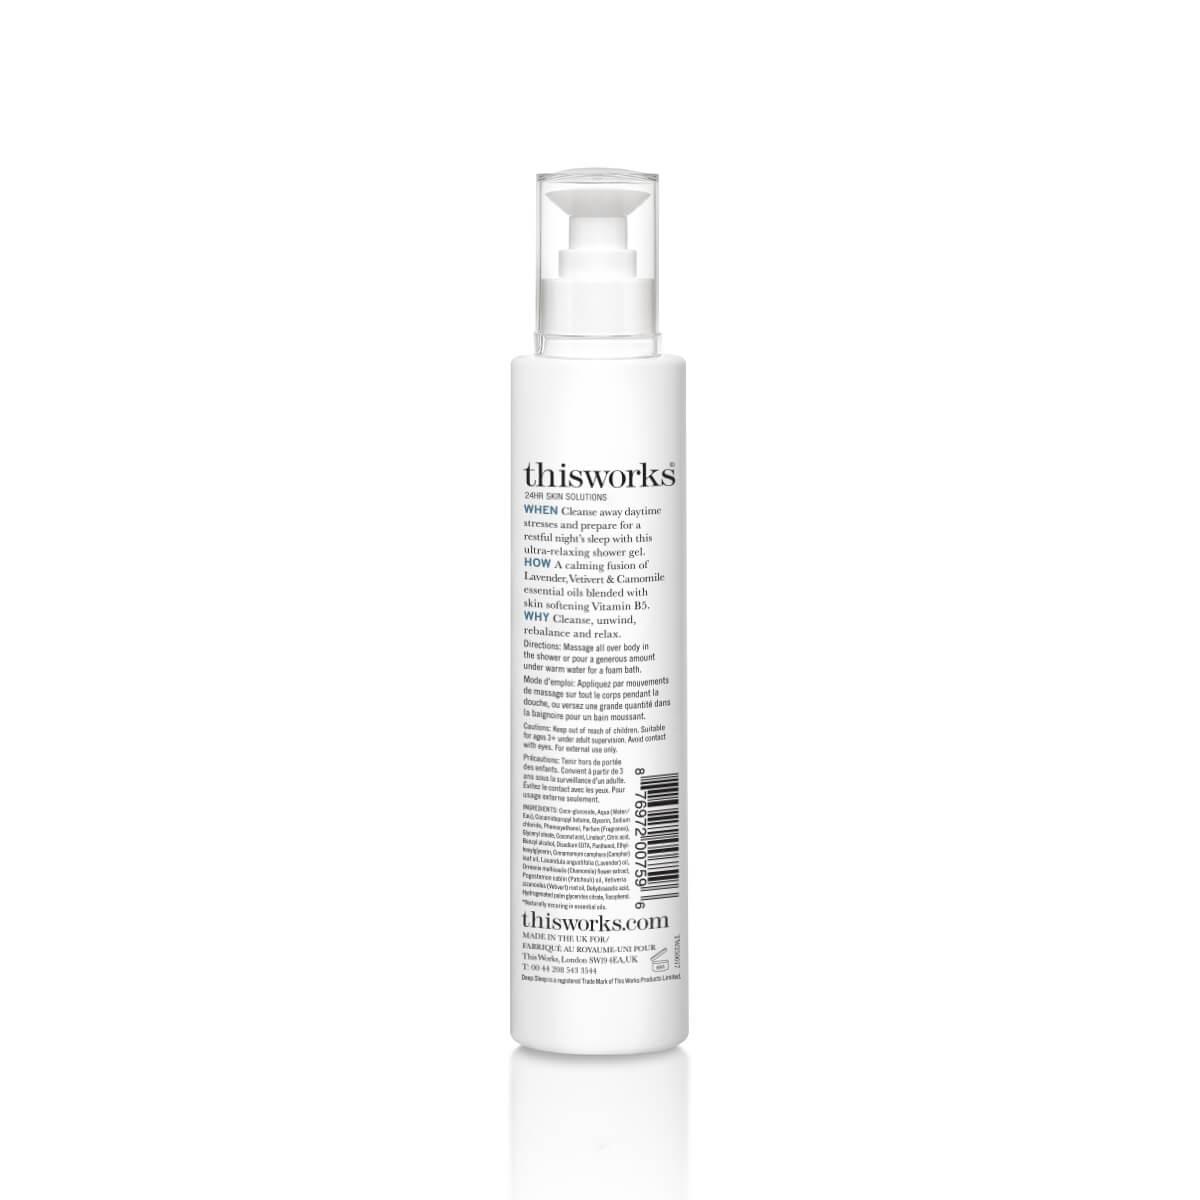 ThisWorks Deep Sleep Shower Gel - back of bottle